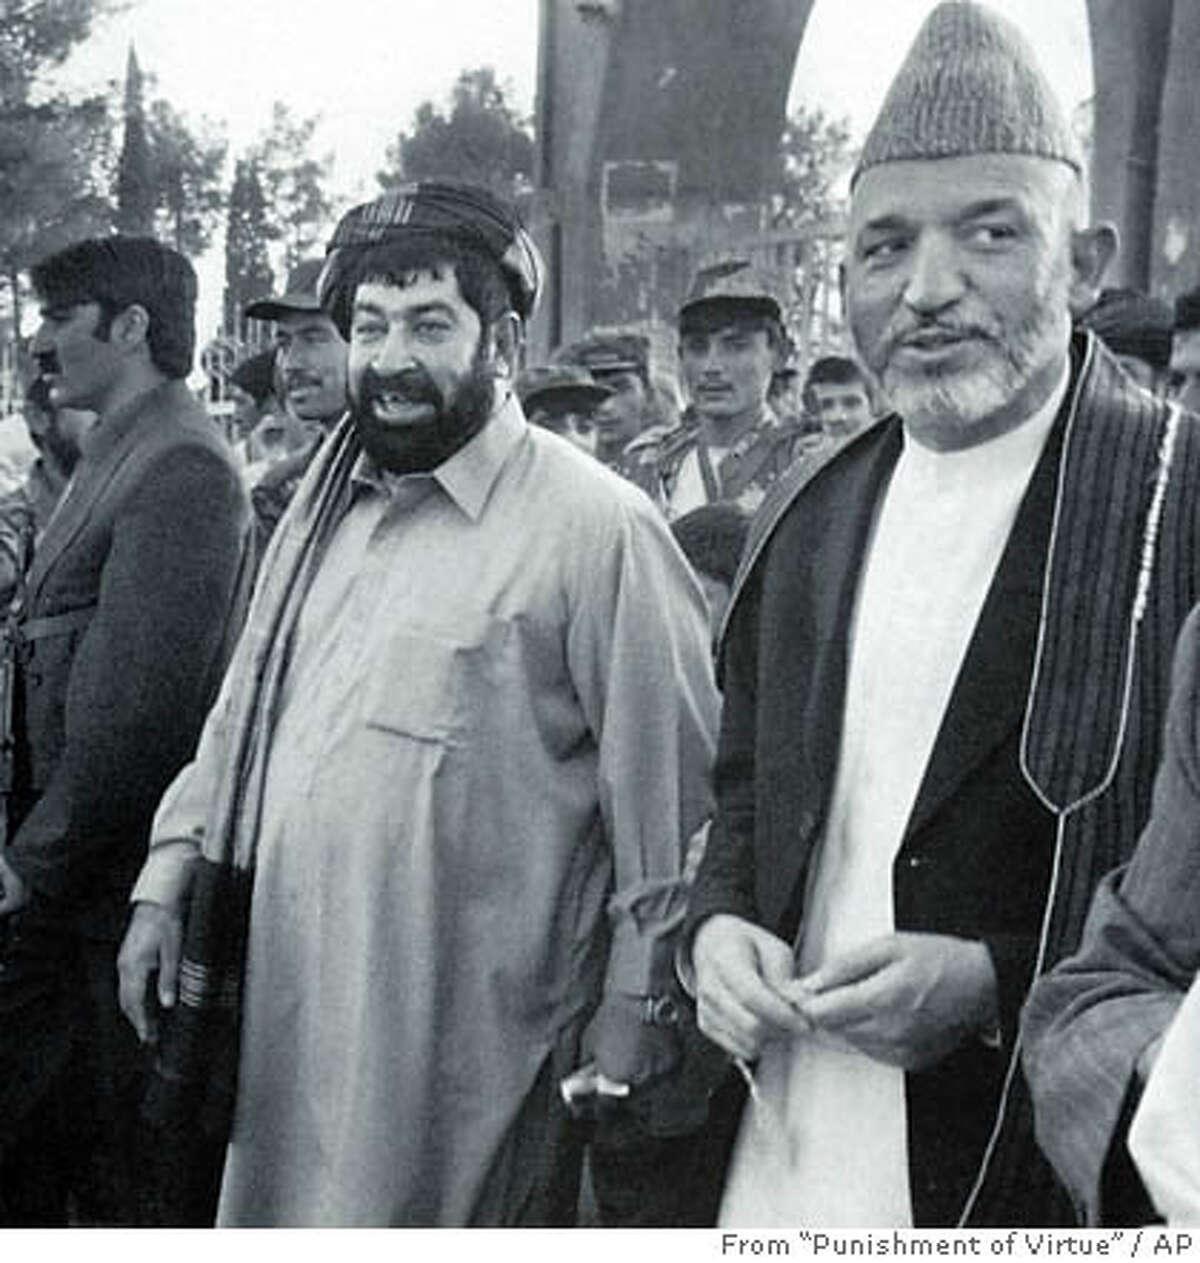 Afghan President Hamid Karzai (right) and Gul Agha Shirzai